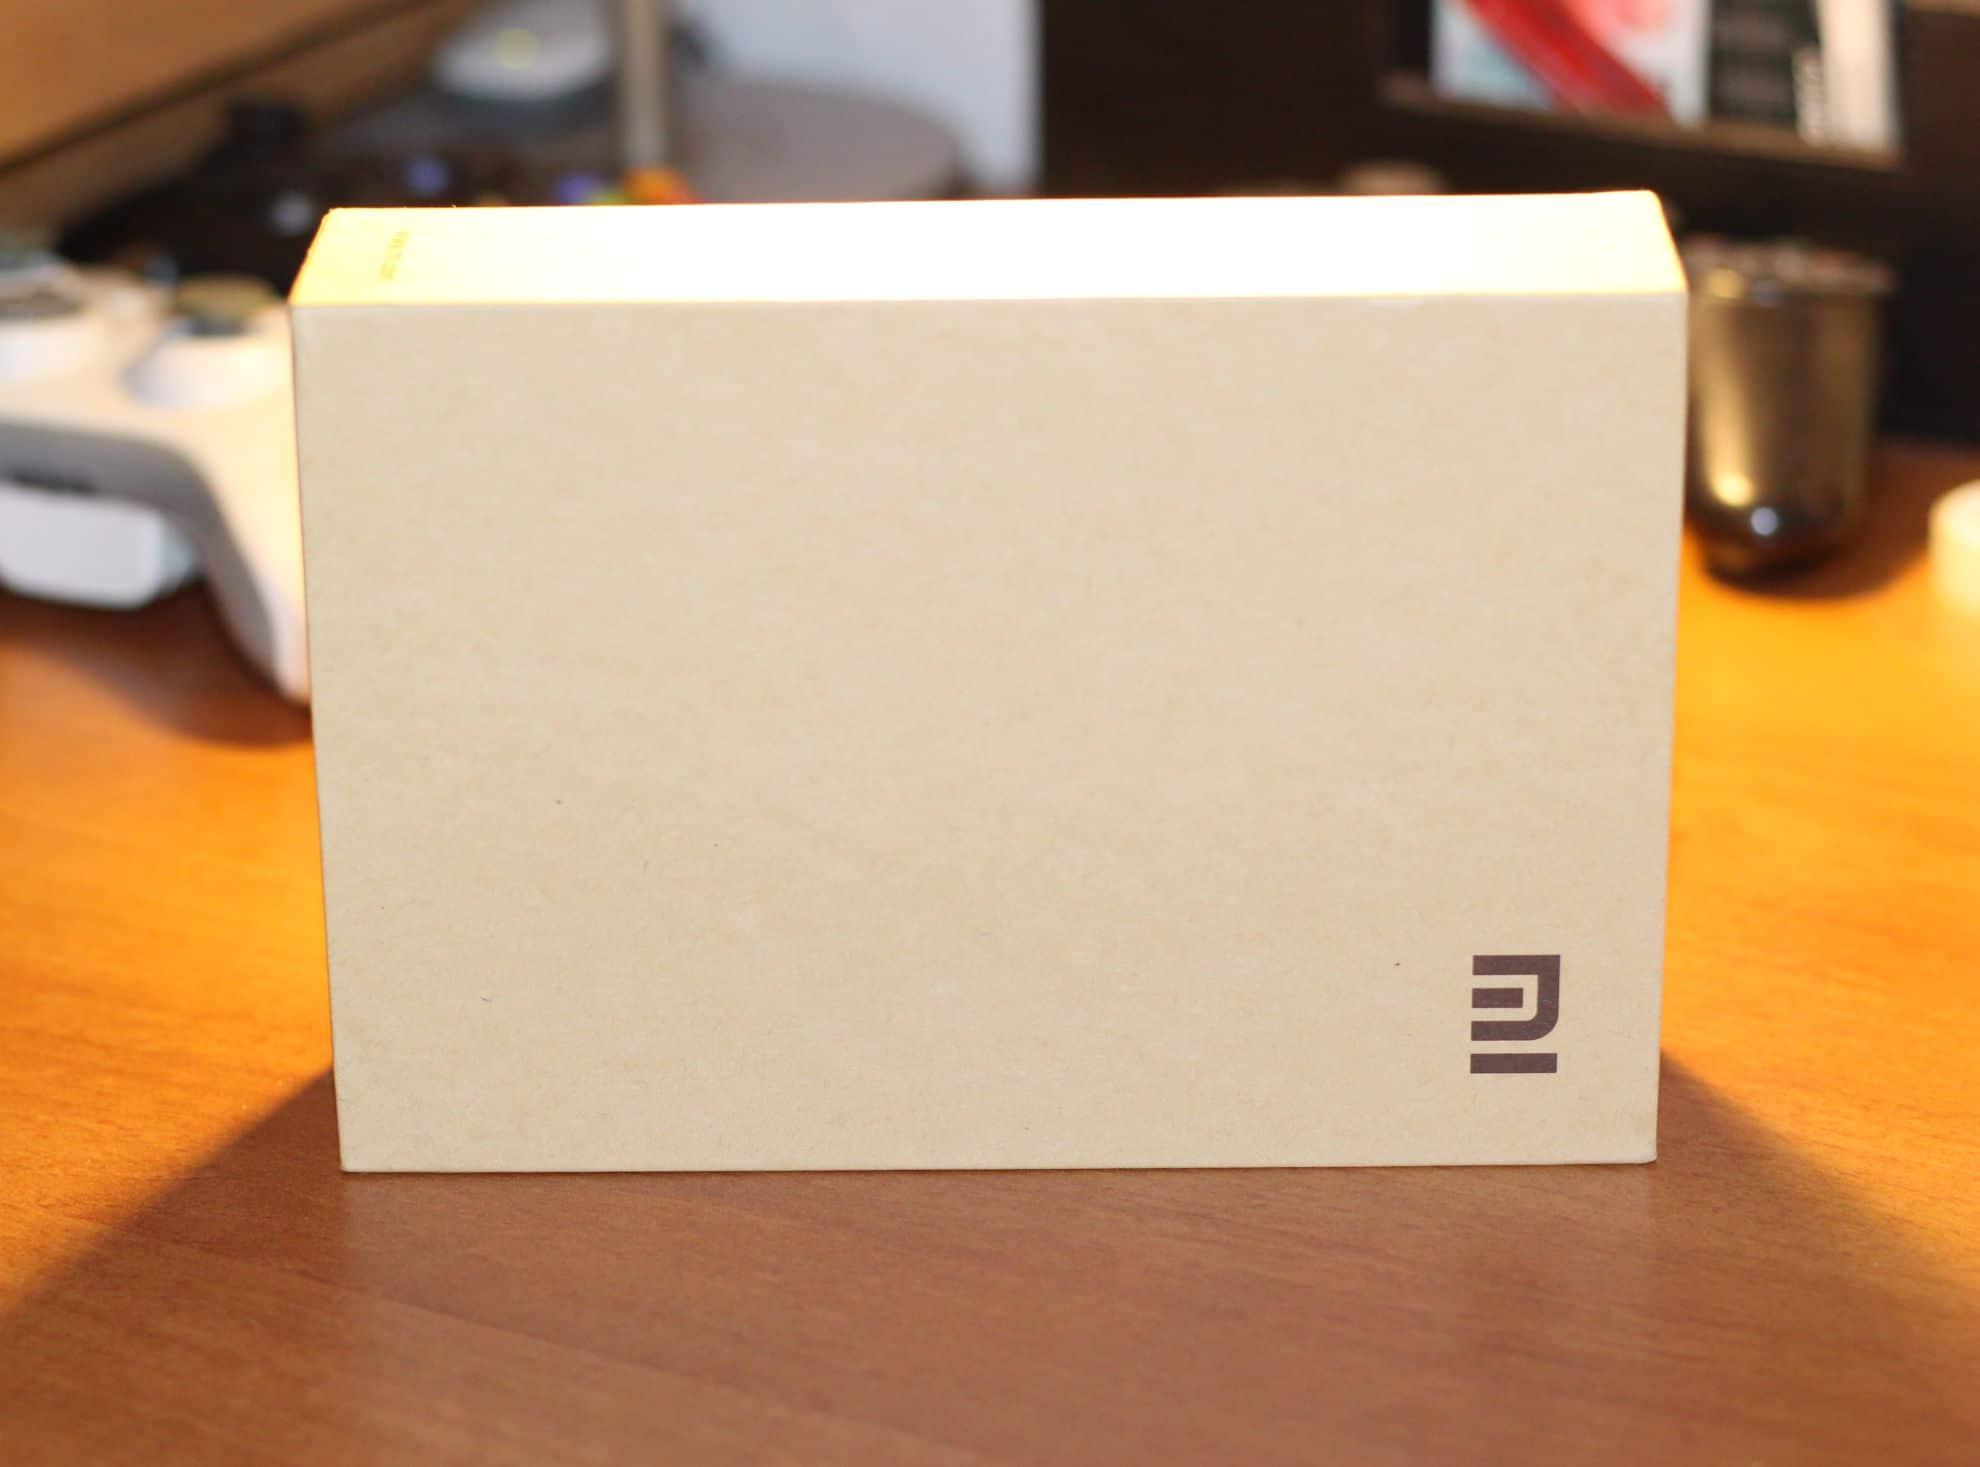 Was wohl in der Kiste steckt? (Foto: GamingGadgets.de)